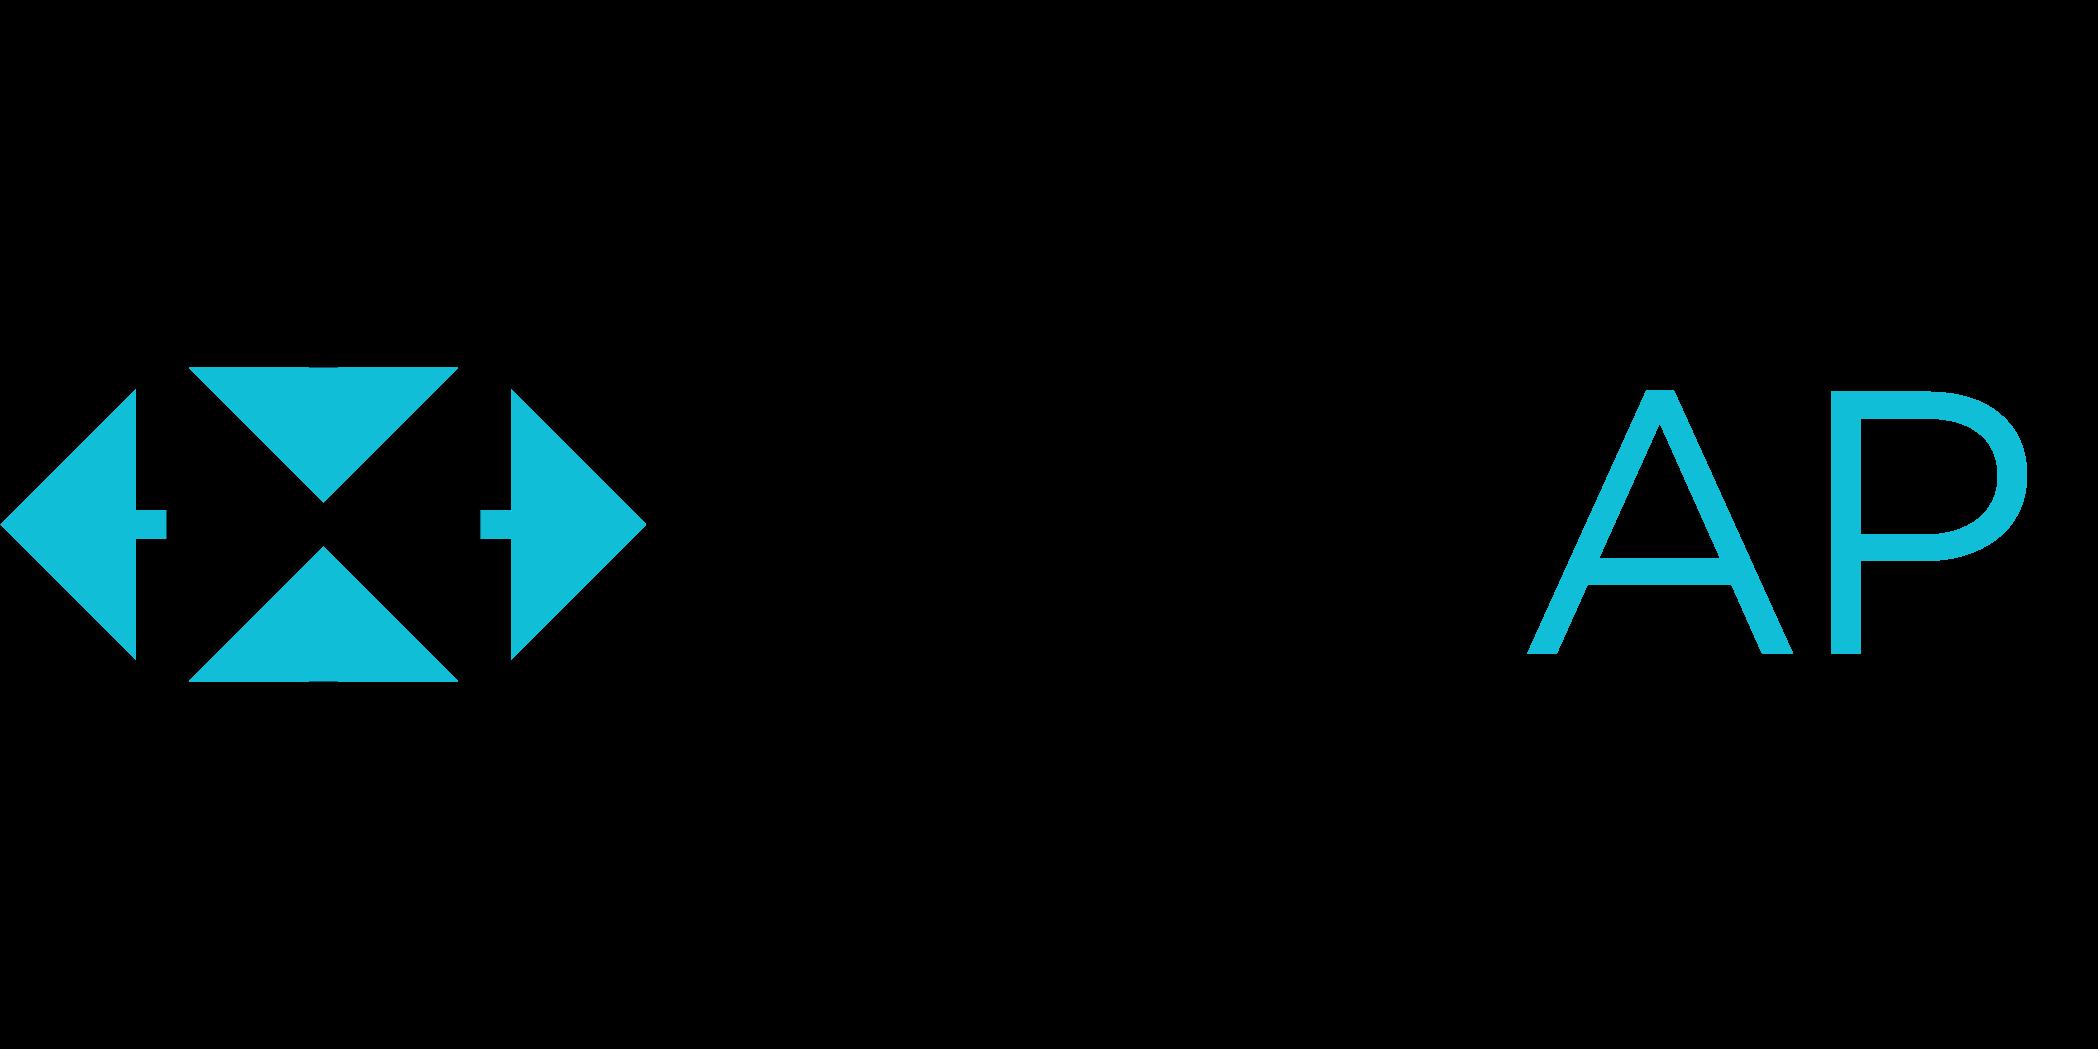 lonap logo